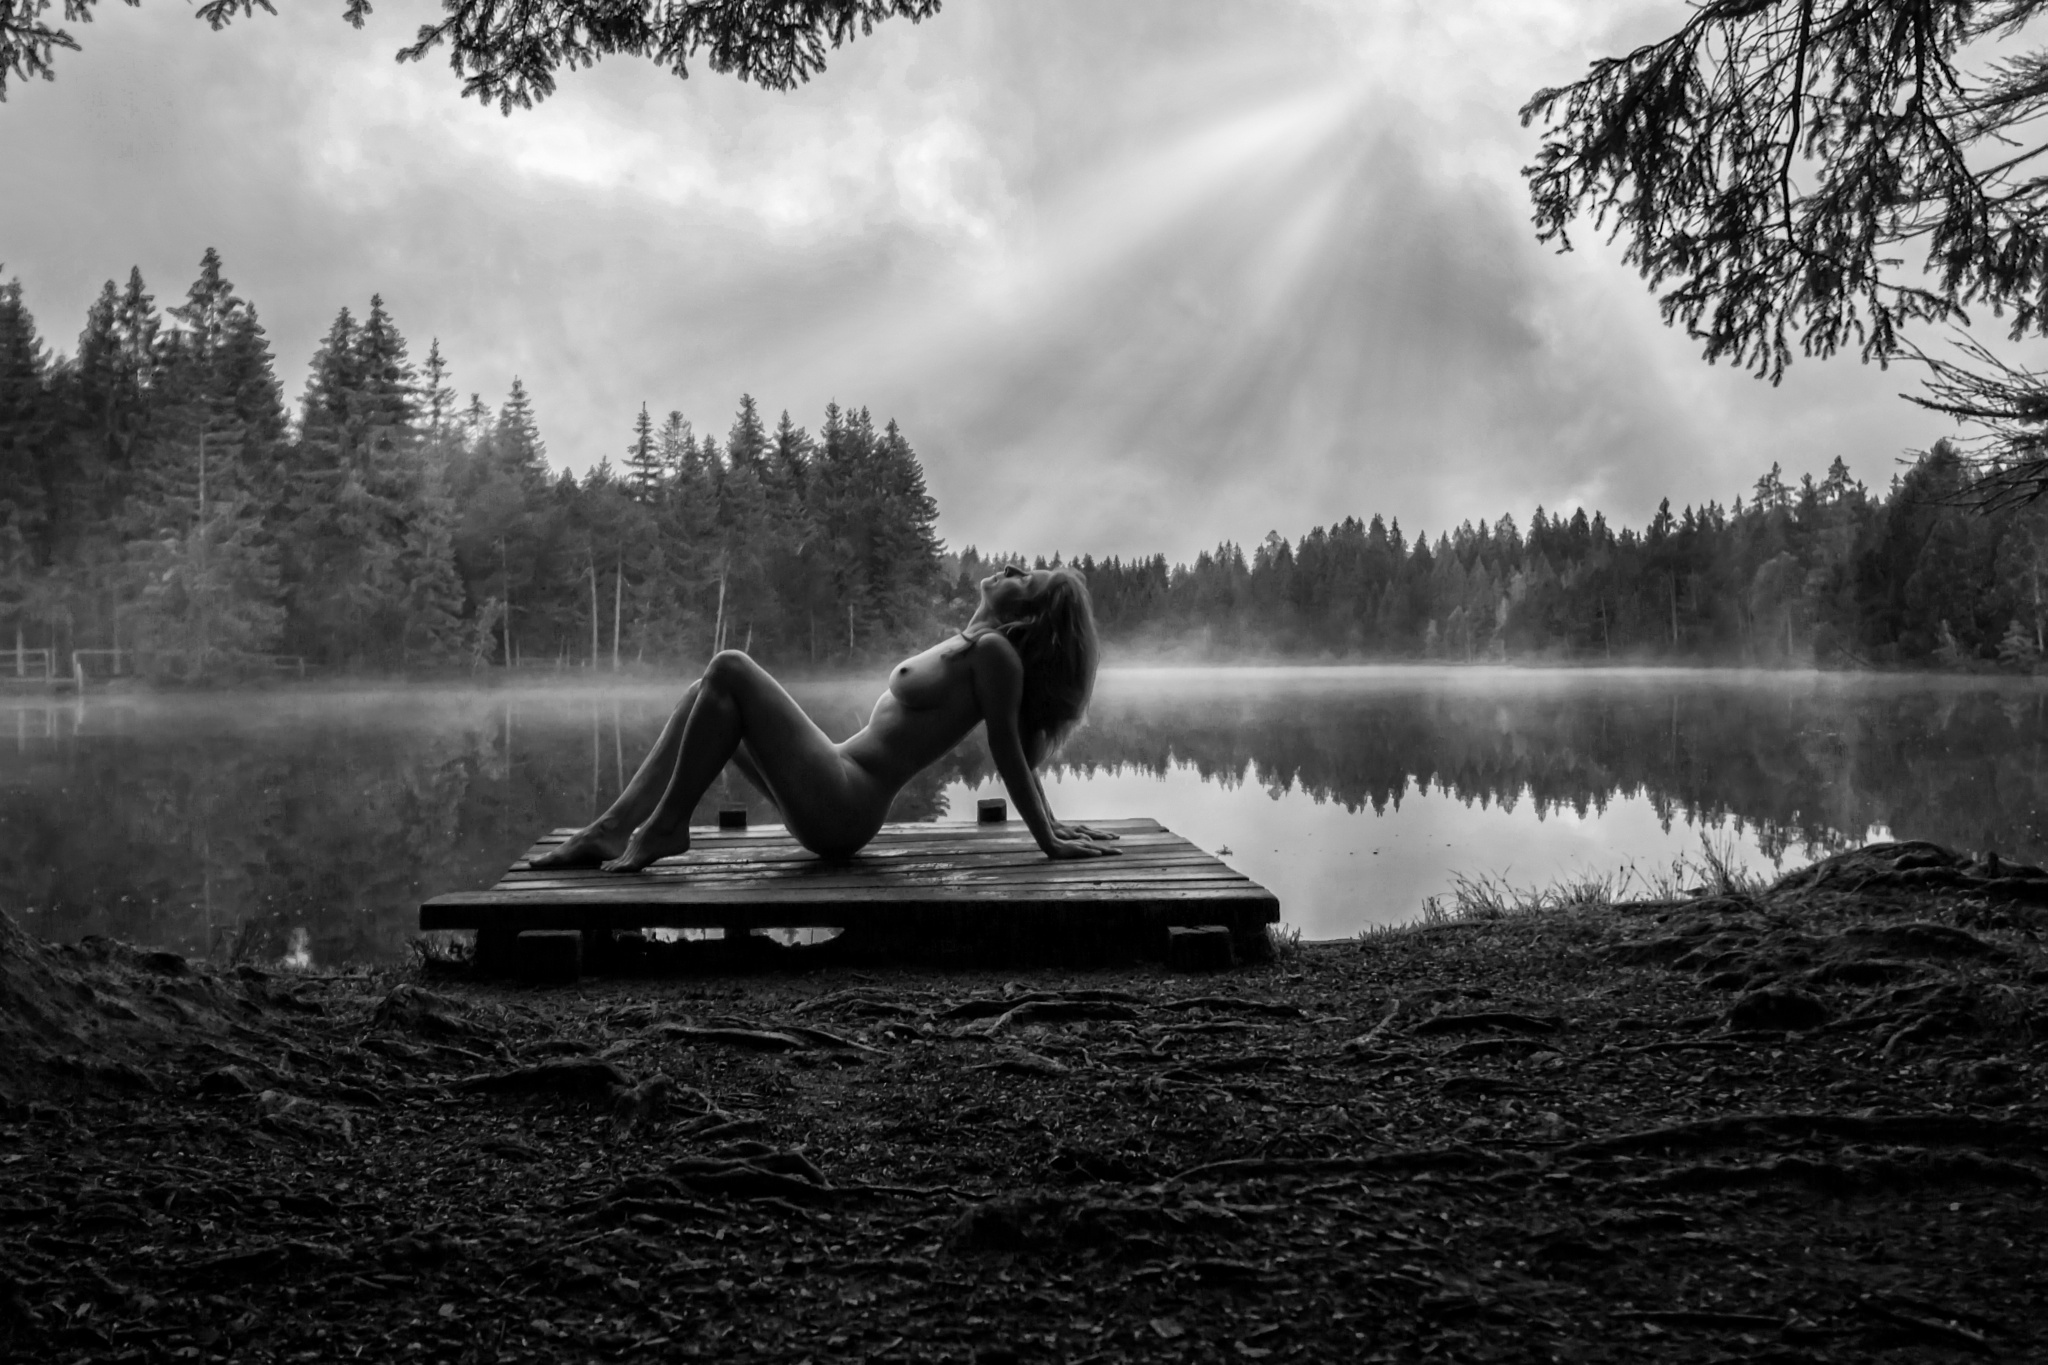 Nude in Morning by bjoerngotzmann